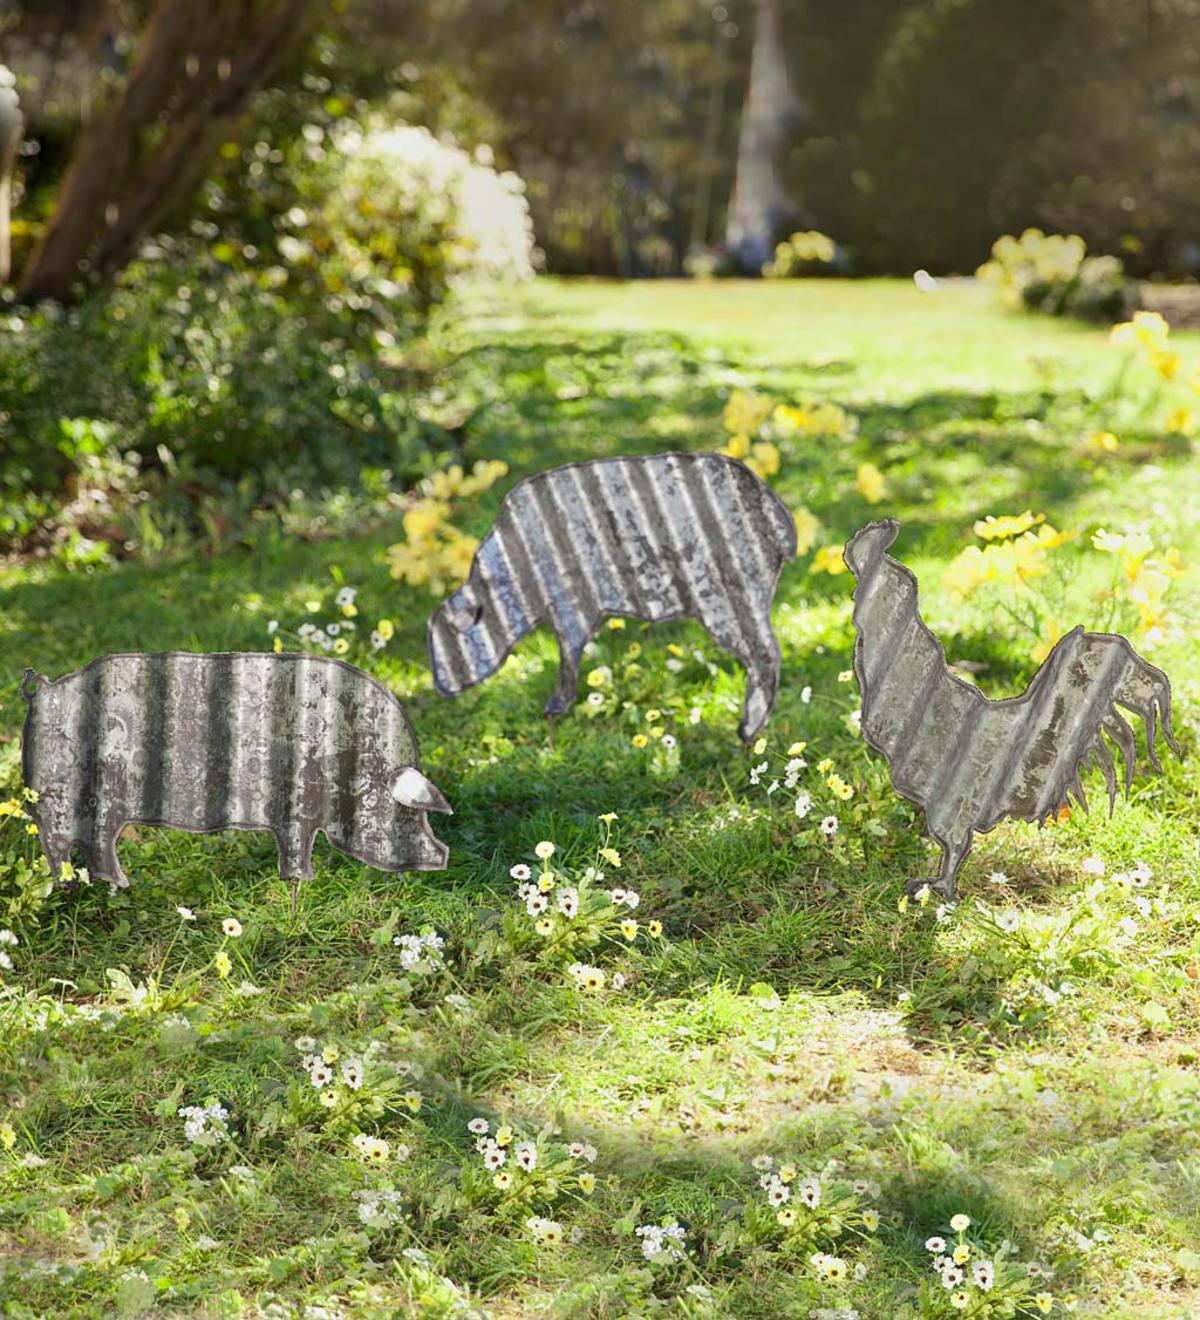 Corrugated Steel Animal Garden Stake